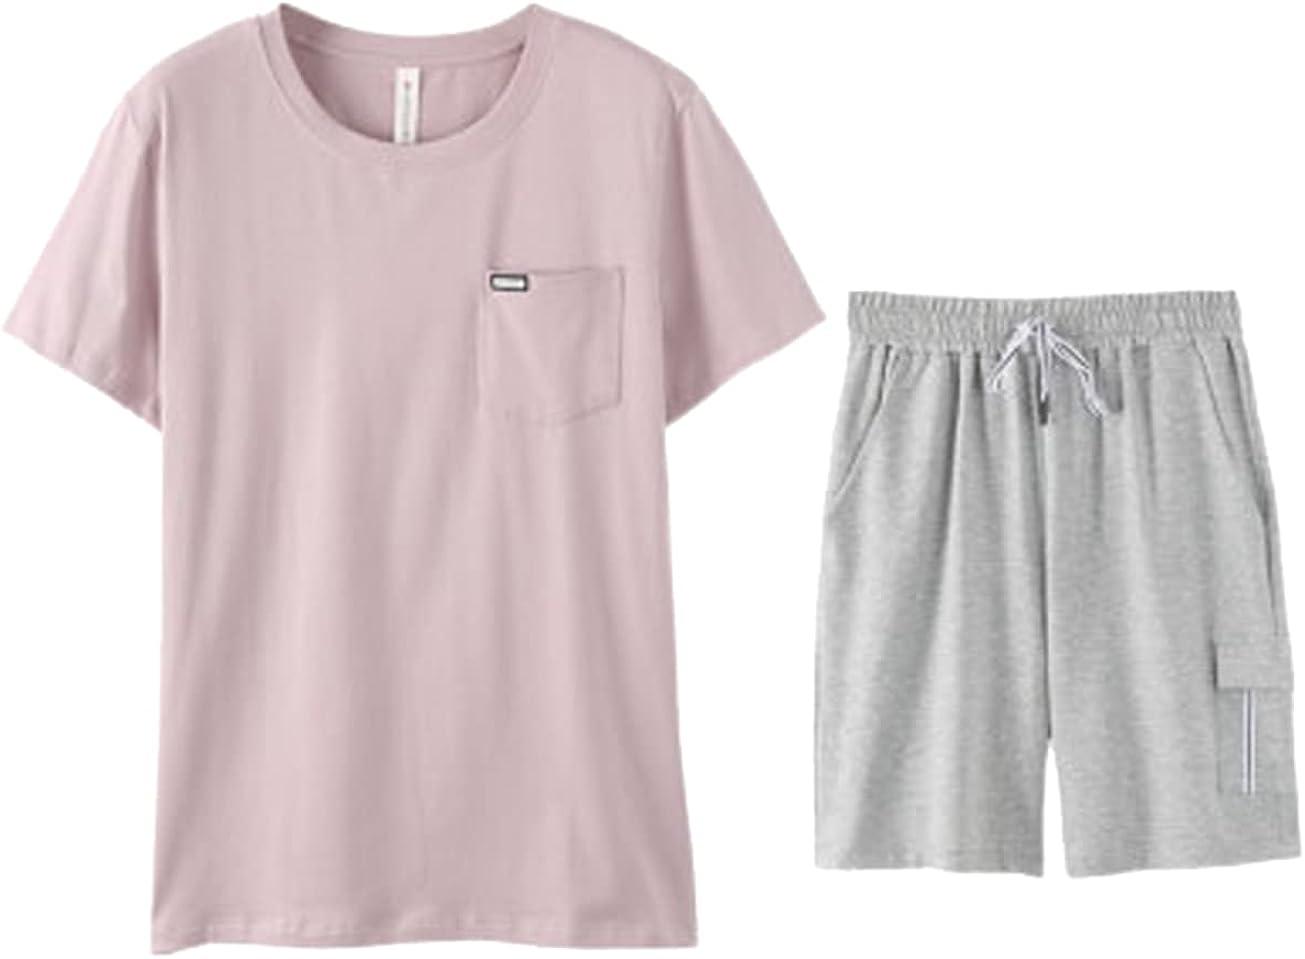 ft FENTENG Men Pajamas Set Short-Sleeved Sleepshirt Cotton Casual Shorts Pants for Home Sleepwear Suits